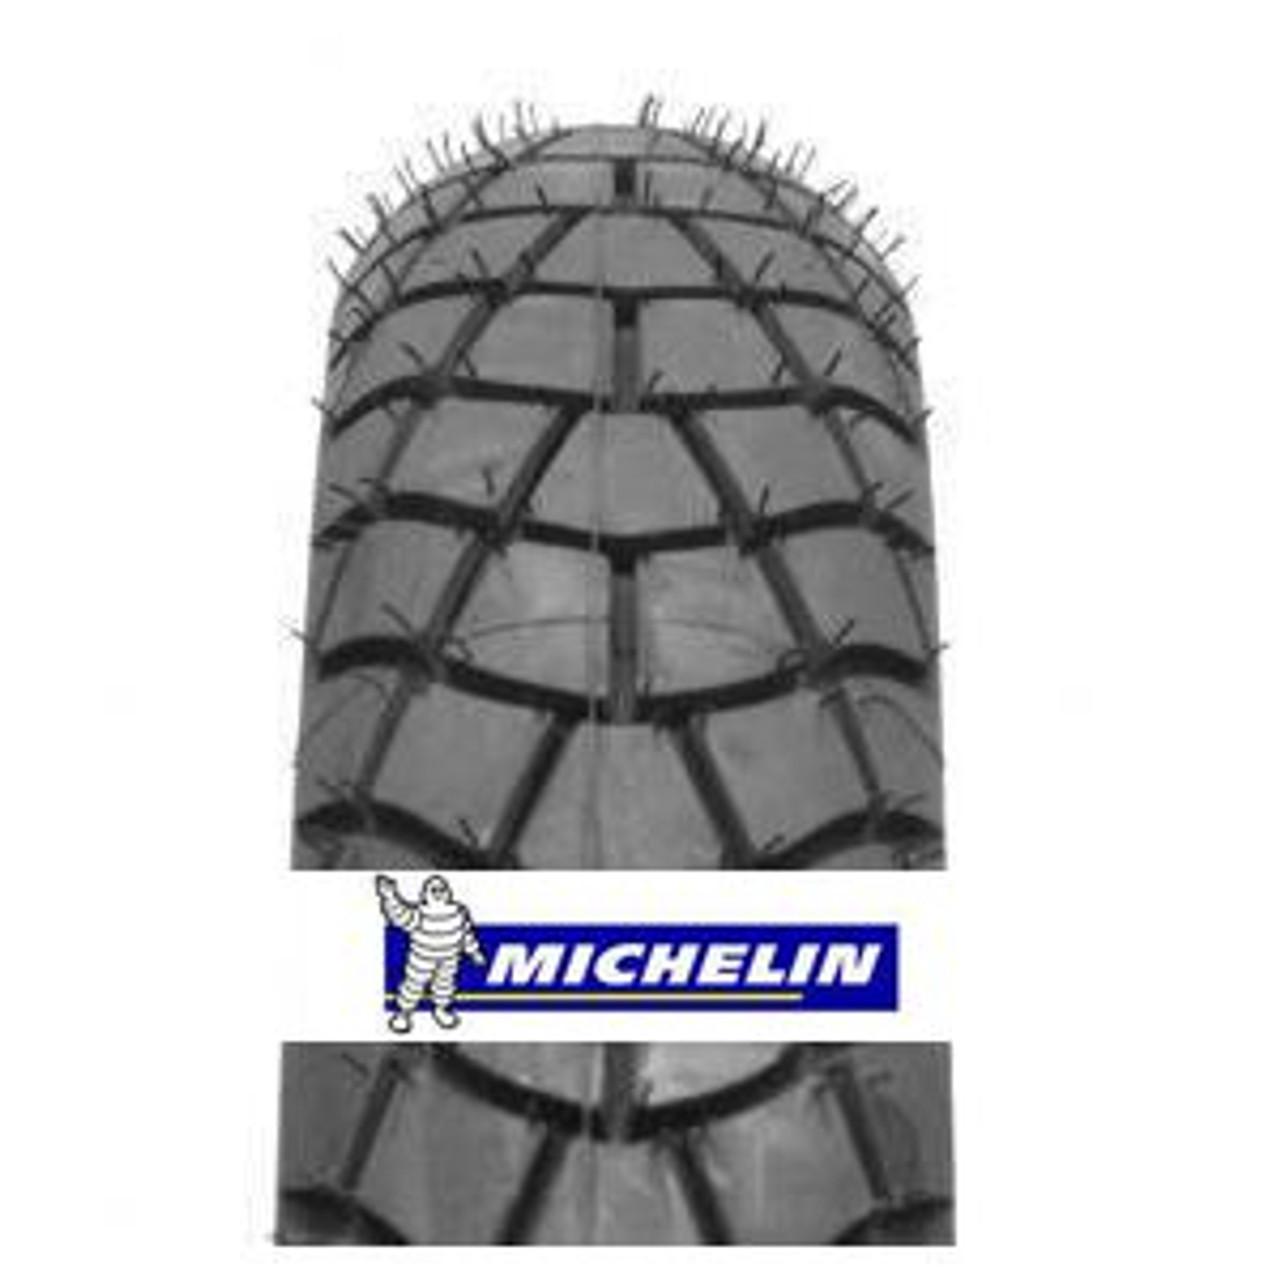 "Michelin M45 2.50"" x 17"" Moped Tire"